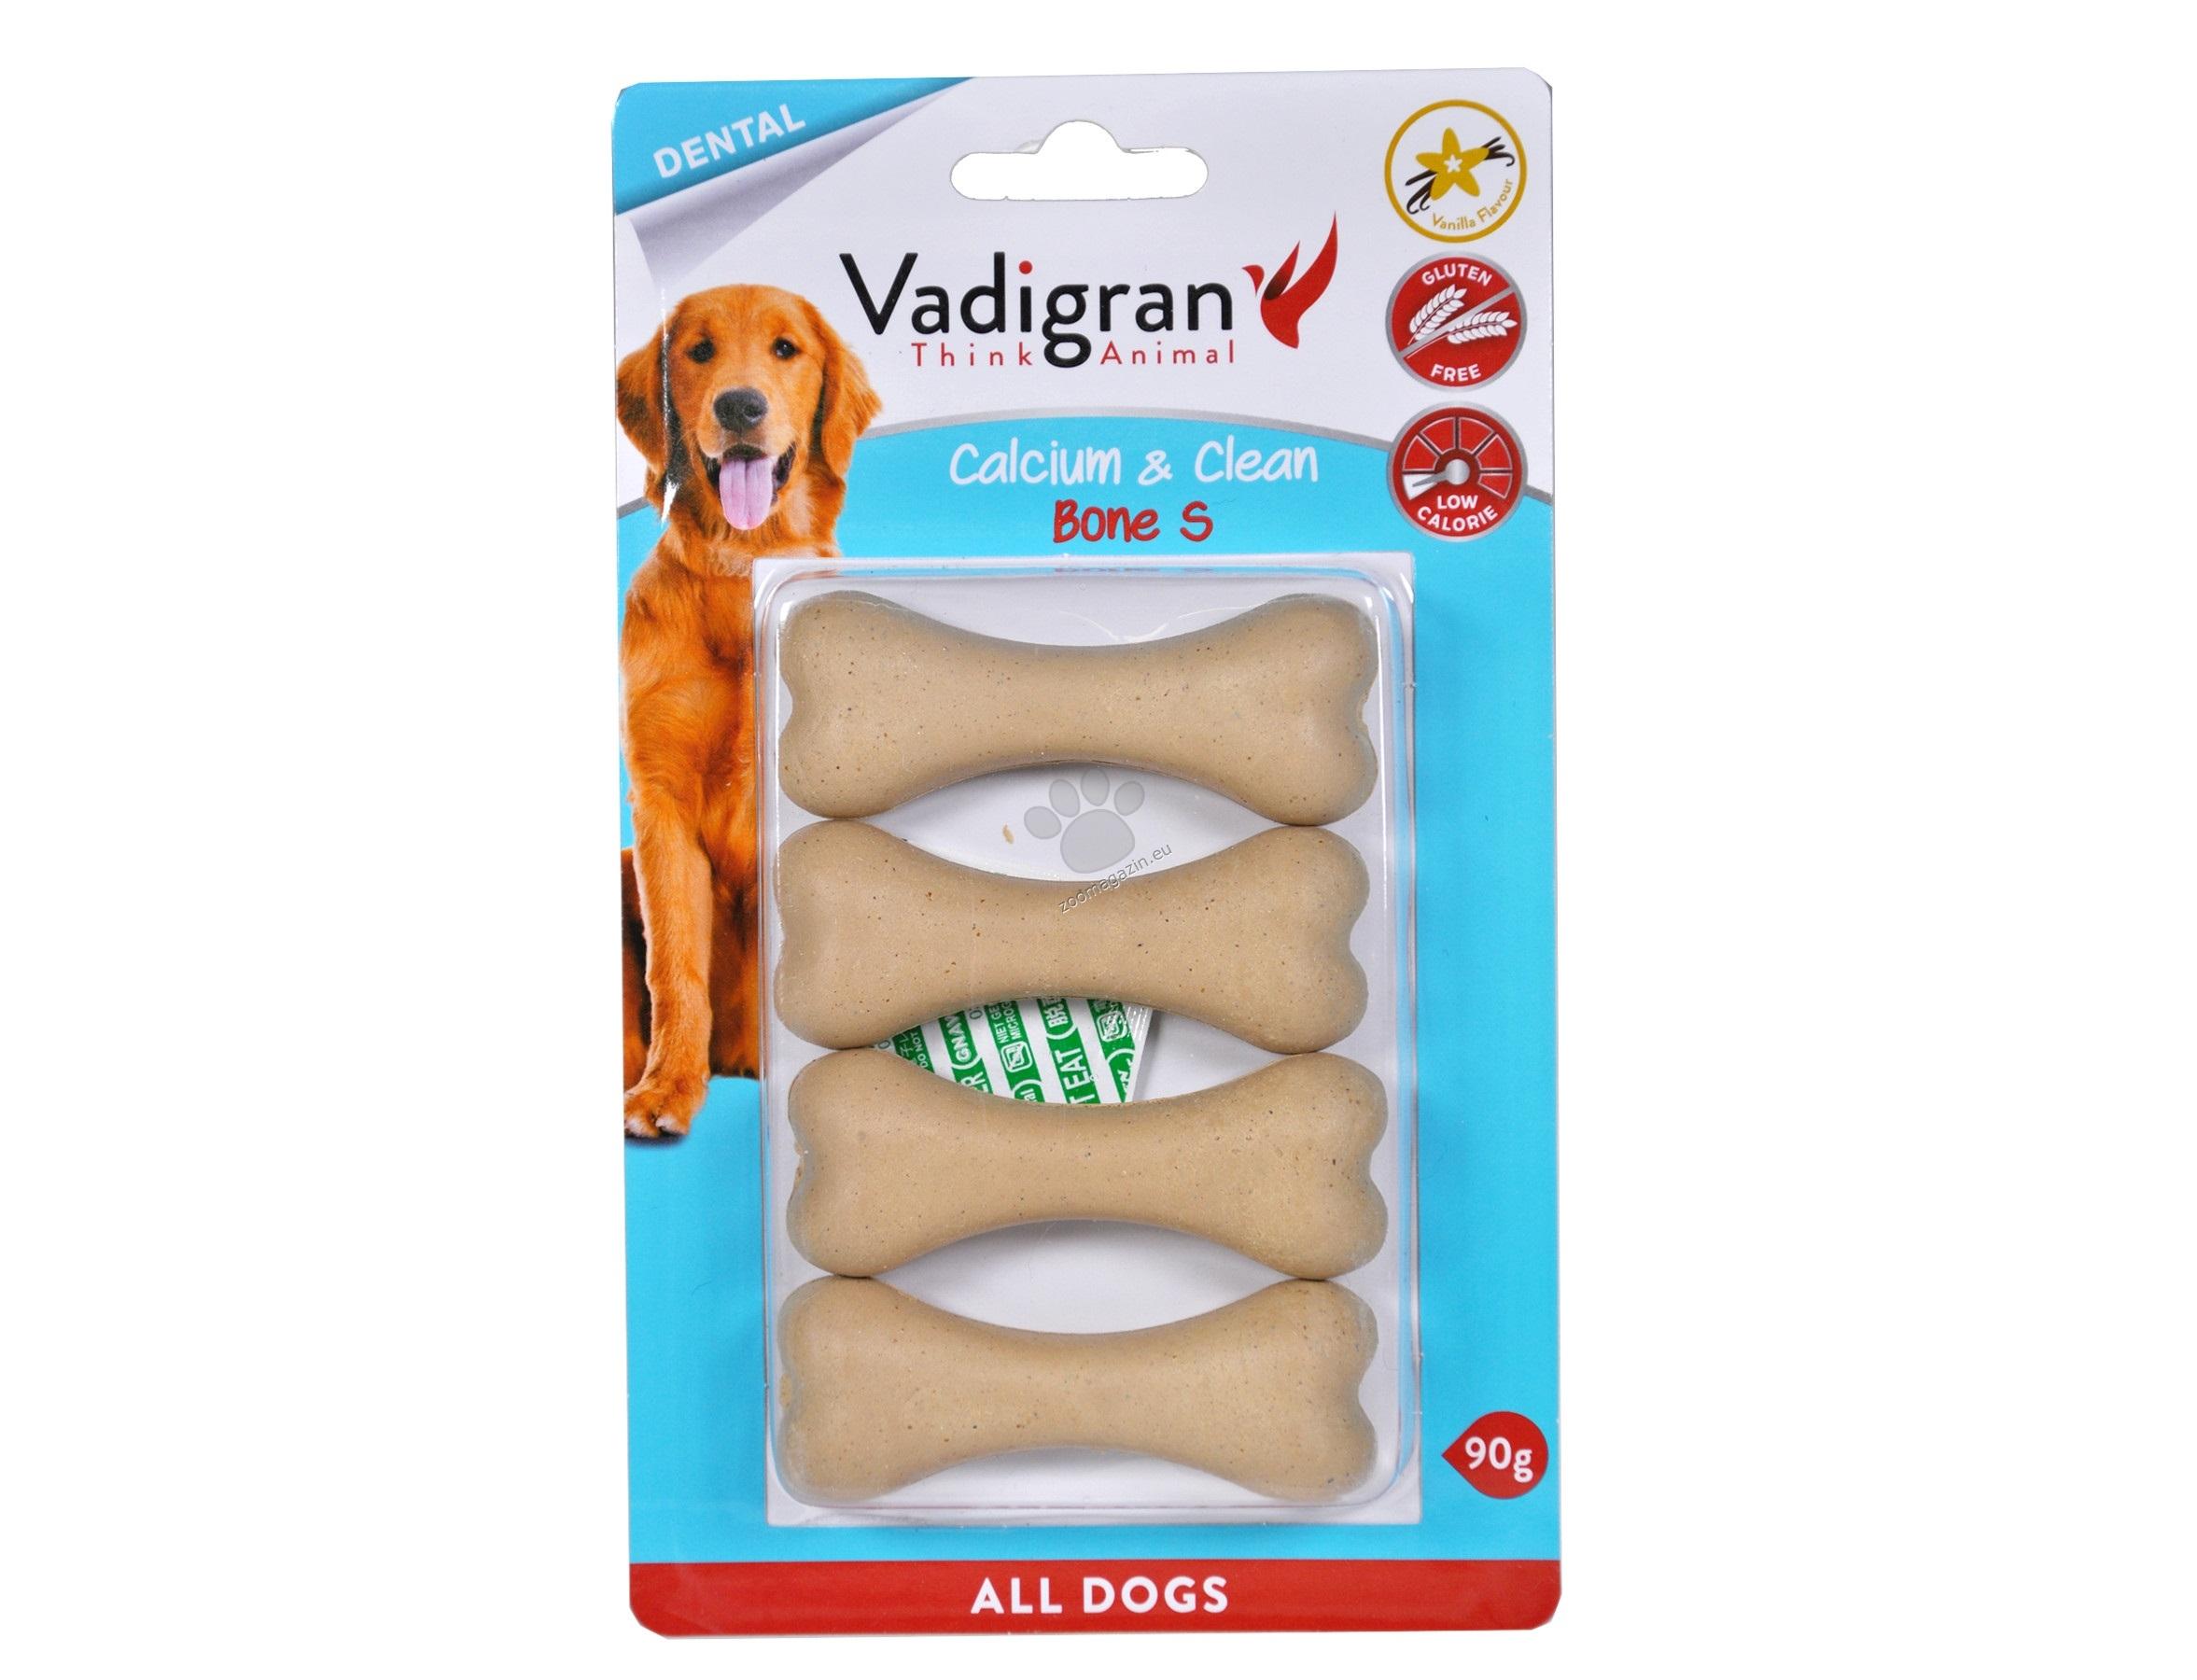 Vadigran - Pressed Chevbone Calcium & Clean - калциево кокалче, за висока устна хигиена 90 гр. / 7.5 см.